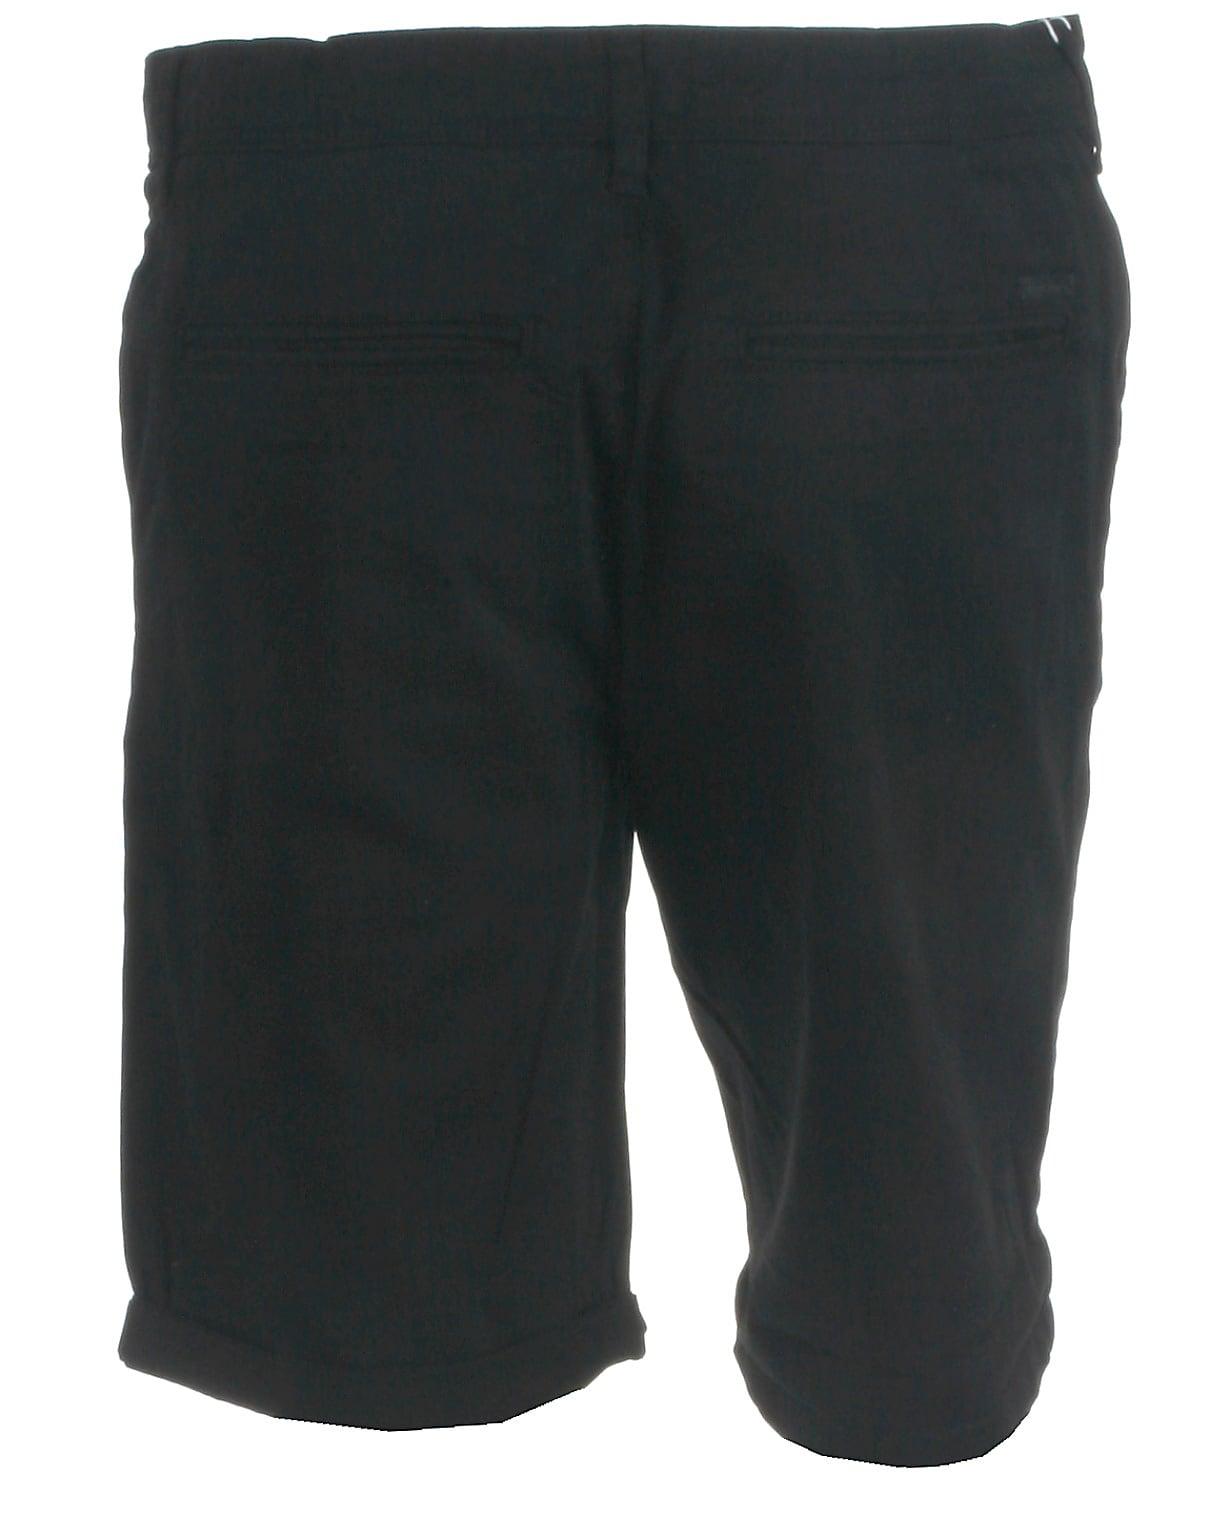 Image of Jack & Jones chino shorts, Bowie, sort